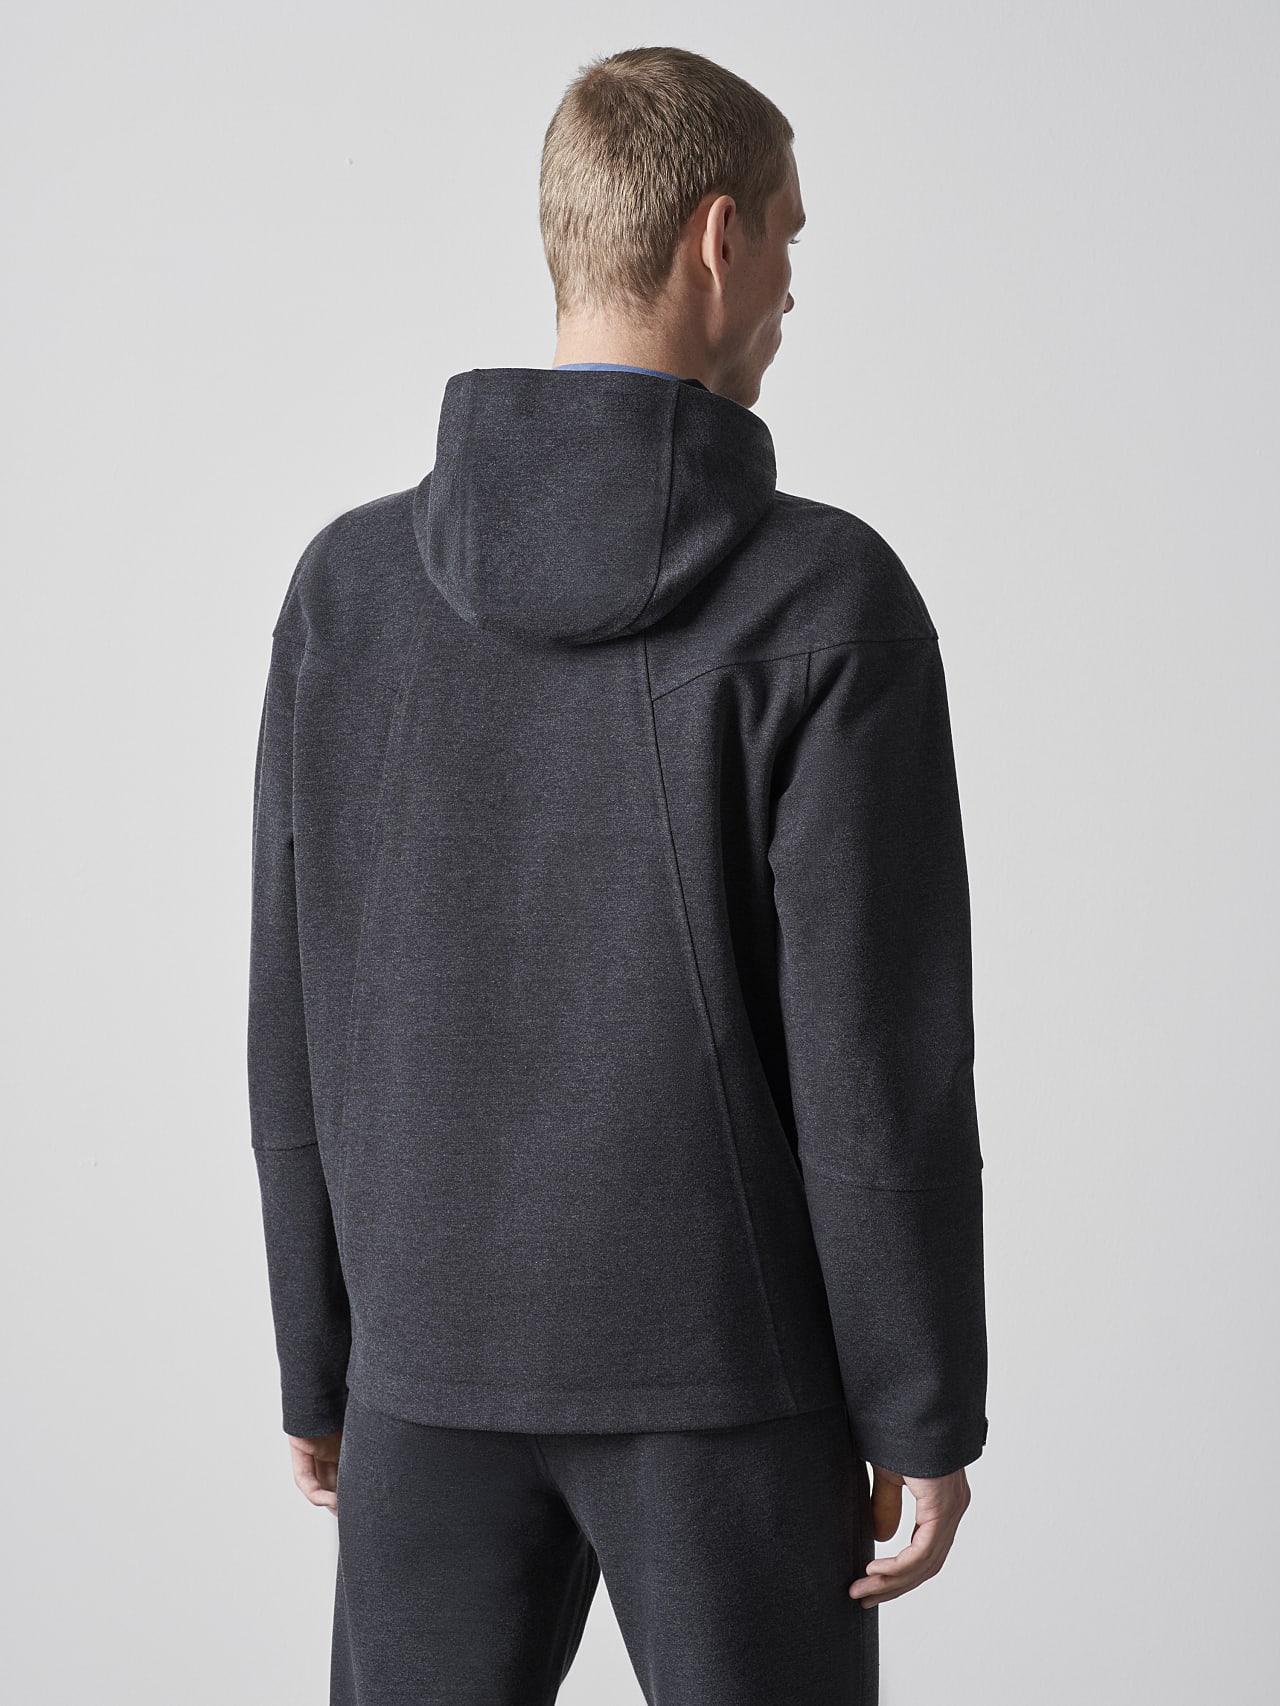 SROTE V1.Y5.02 Waterproof Sweatjacket dark grey / anthracite Front Main Alpha Tauri